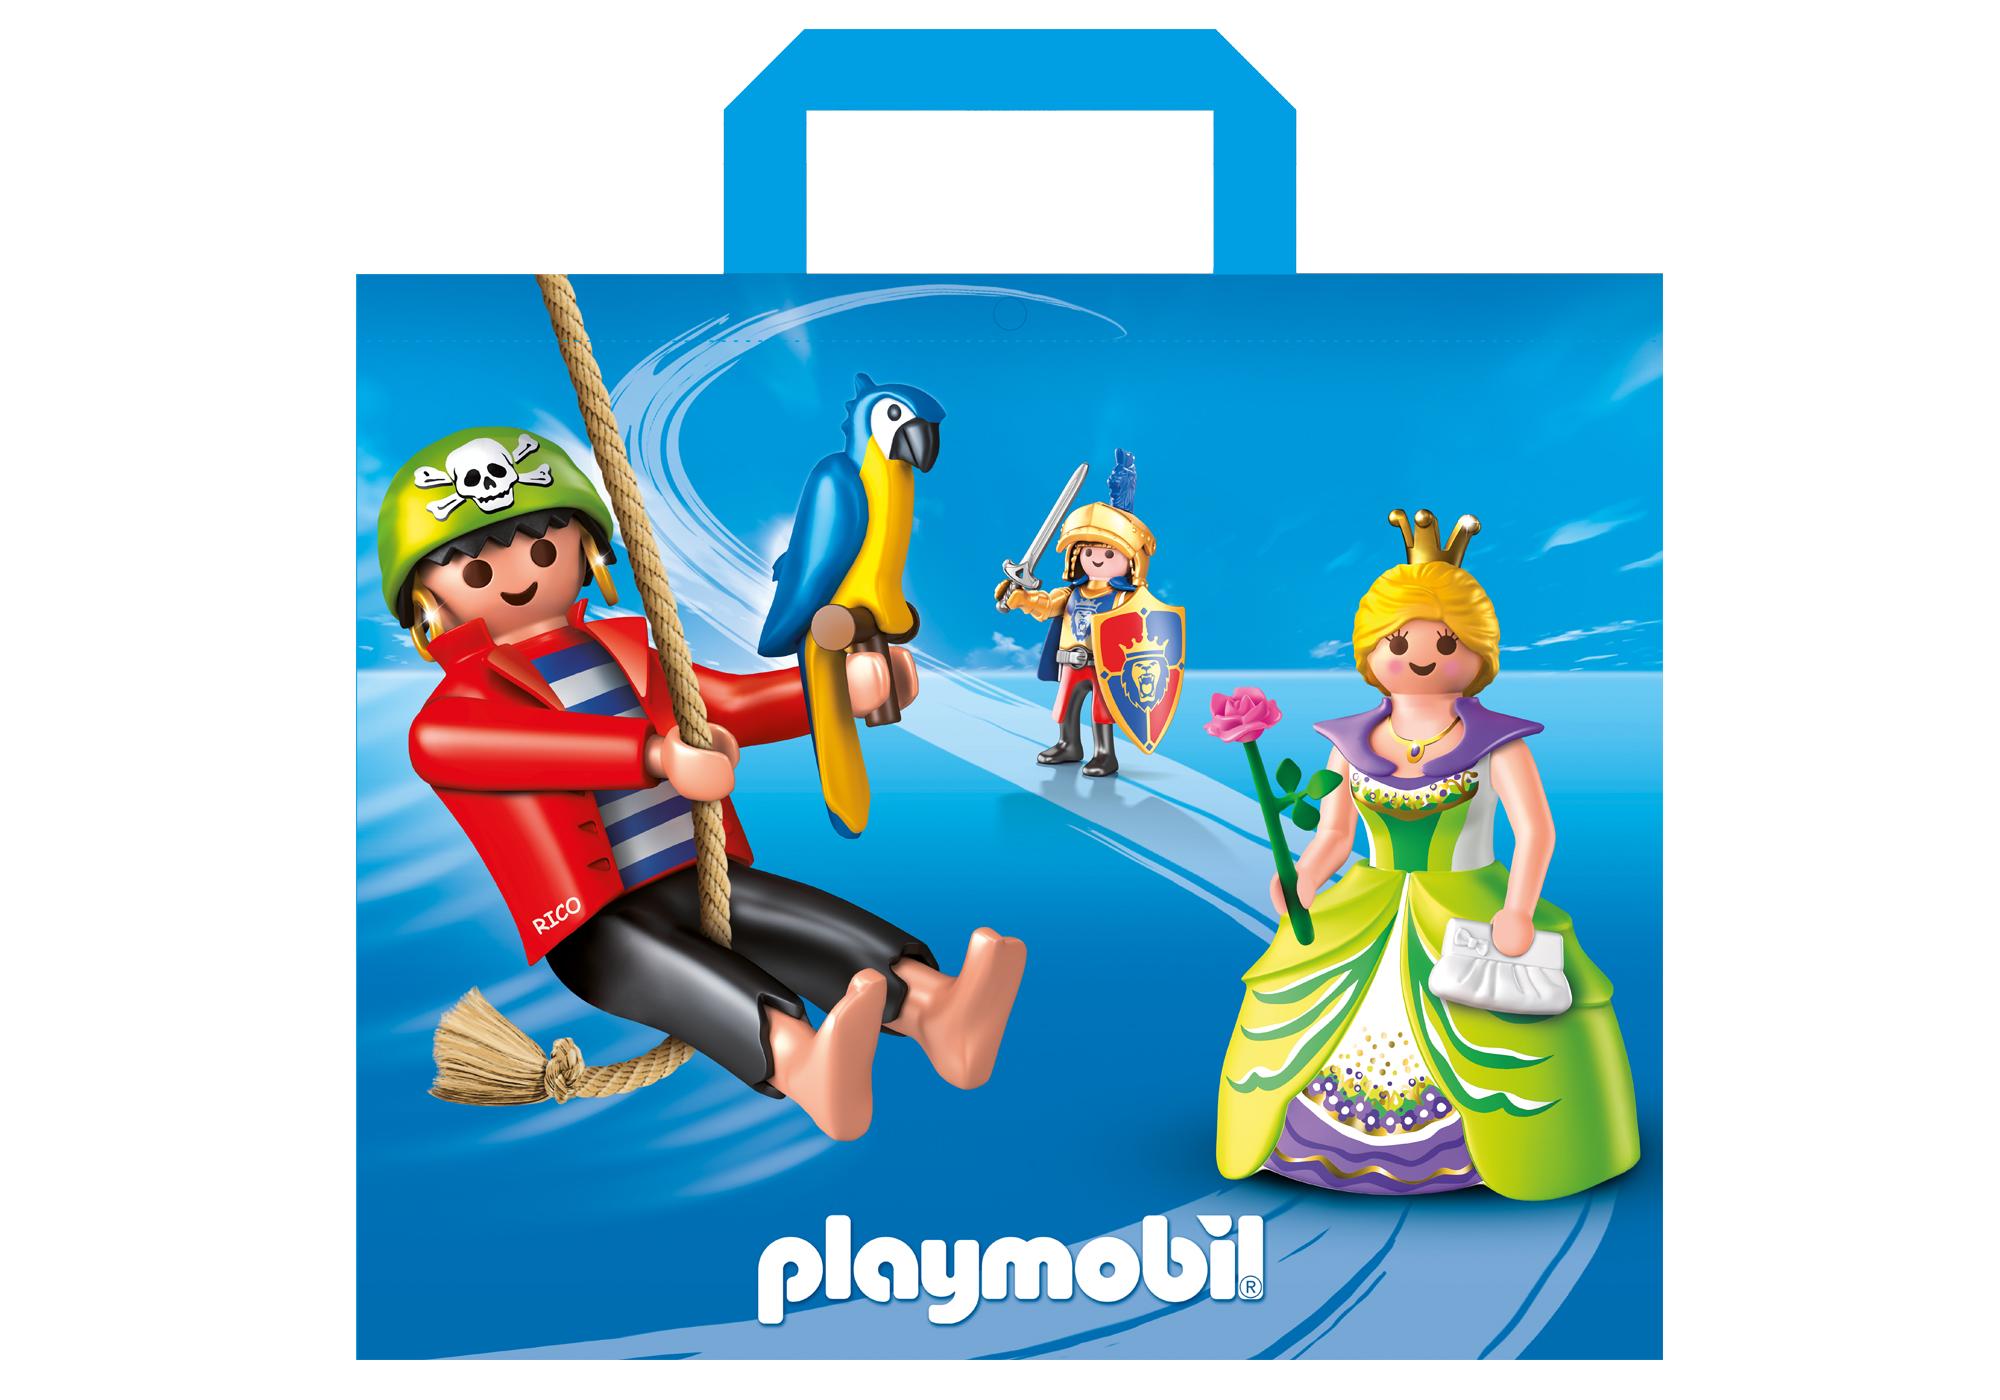 http://media.playmobil.com/i/playmobil/86489_product_detail/Einkaufstasche